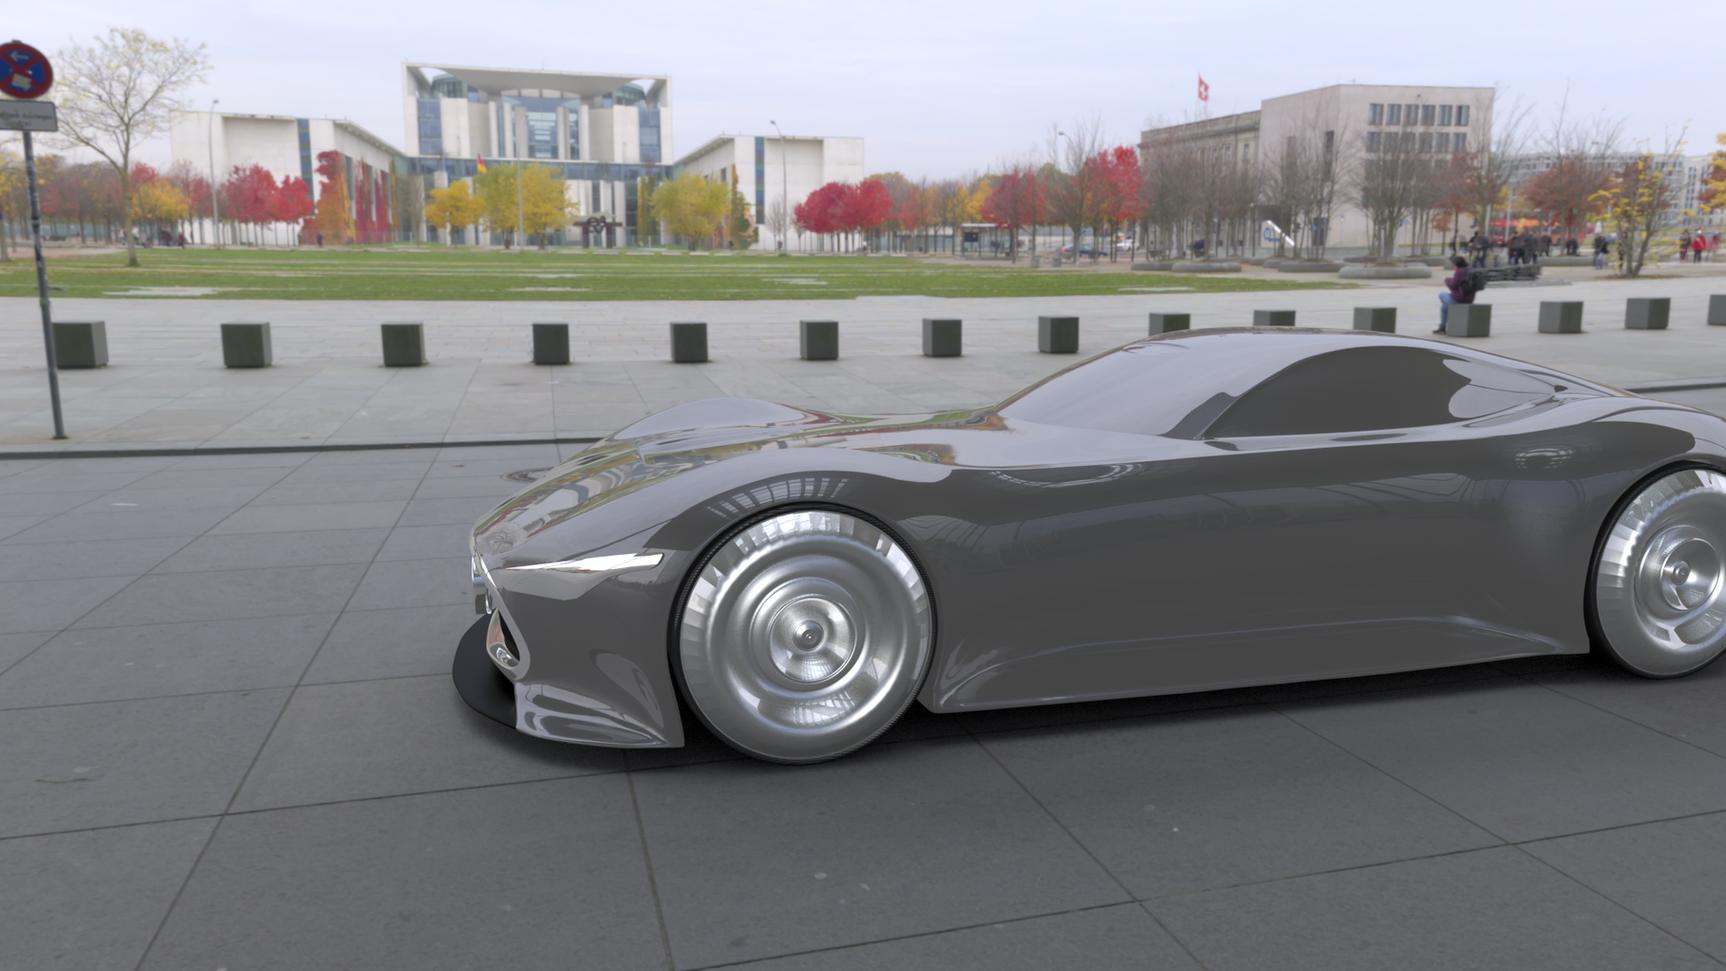 Bil-GT-Vision1-Christoffer-Wallberg-2020